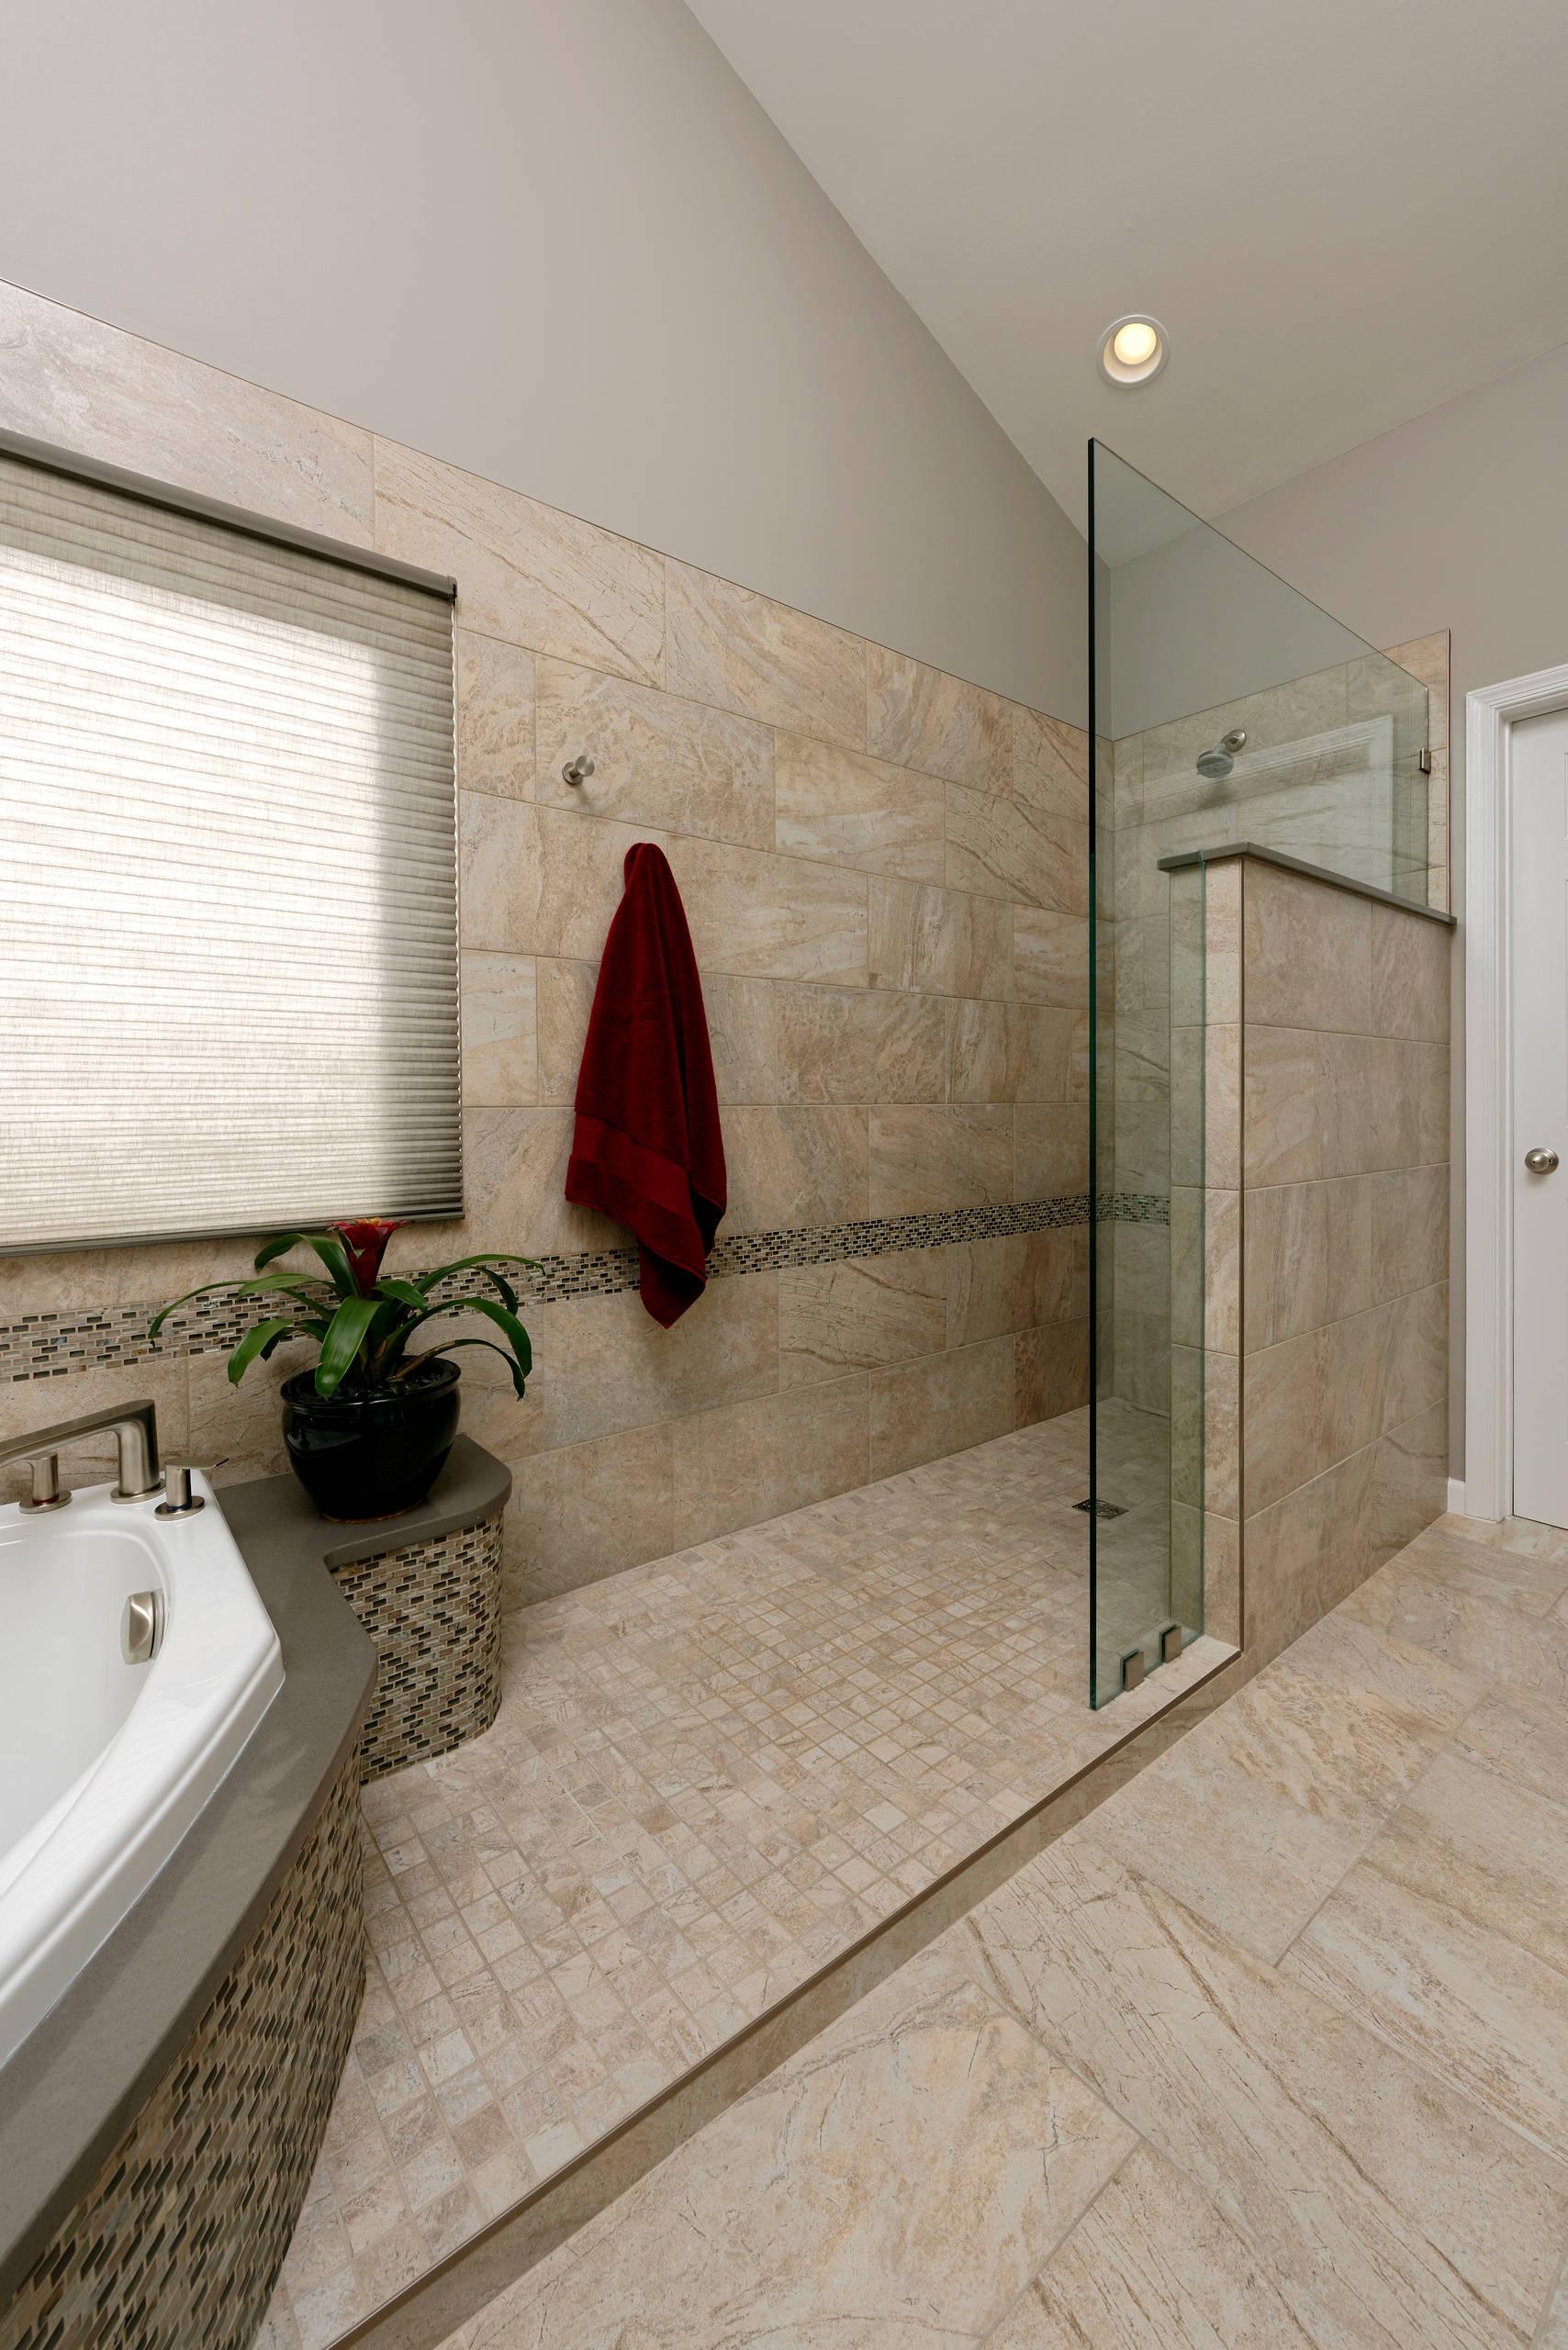 Fairfax Master Bathroom Remodel